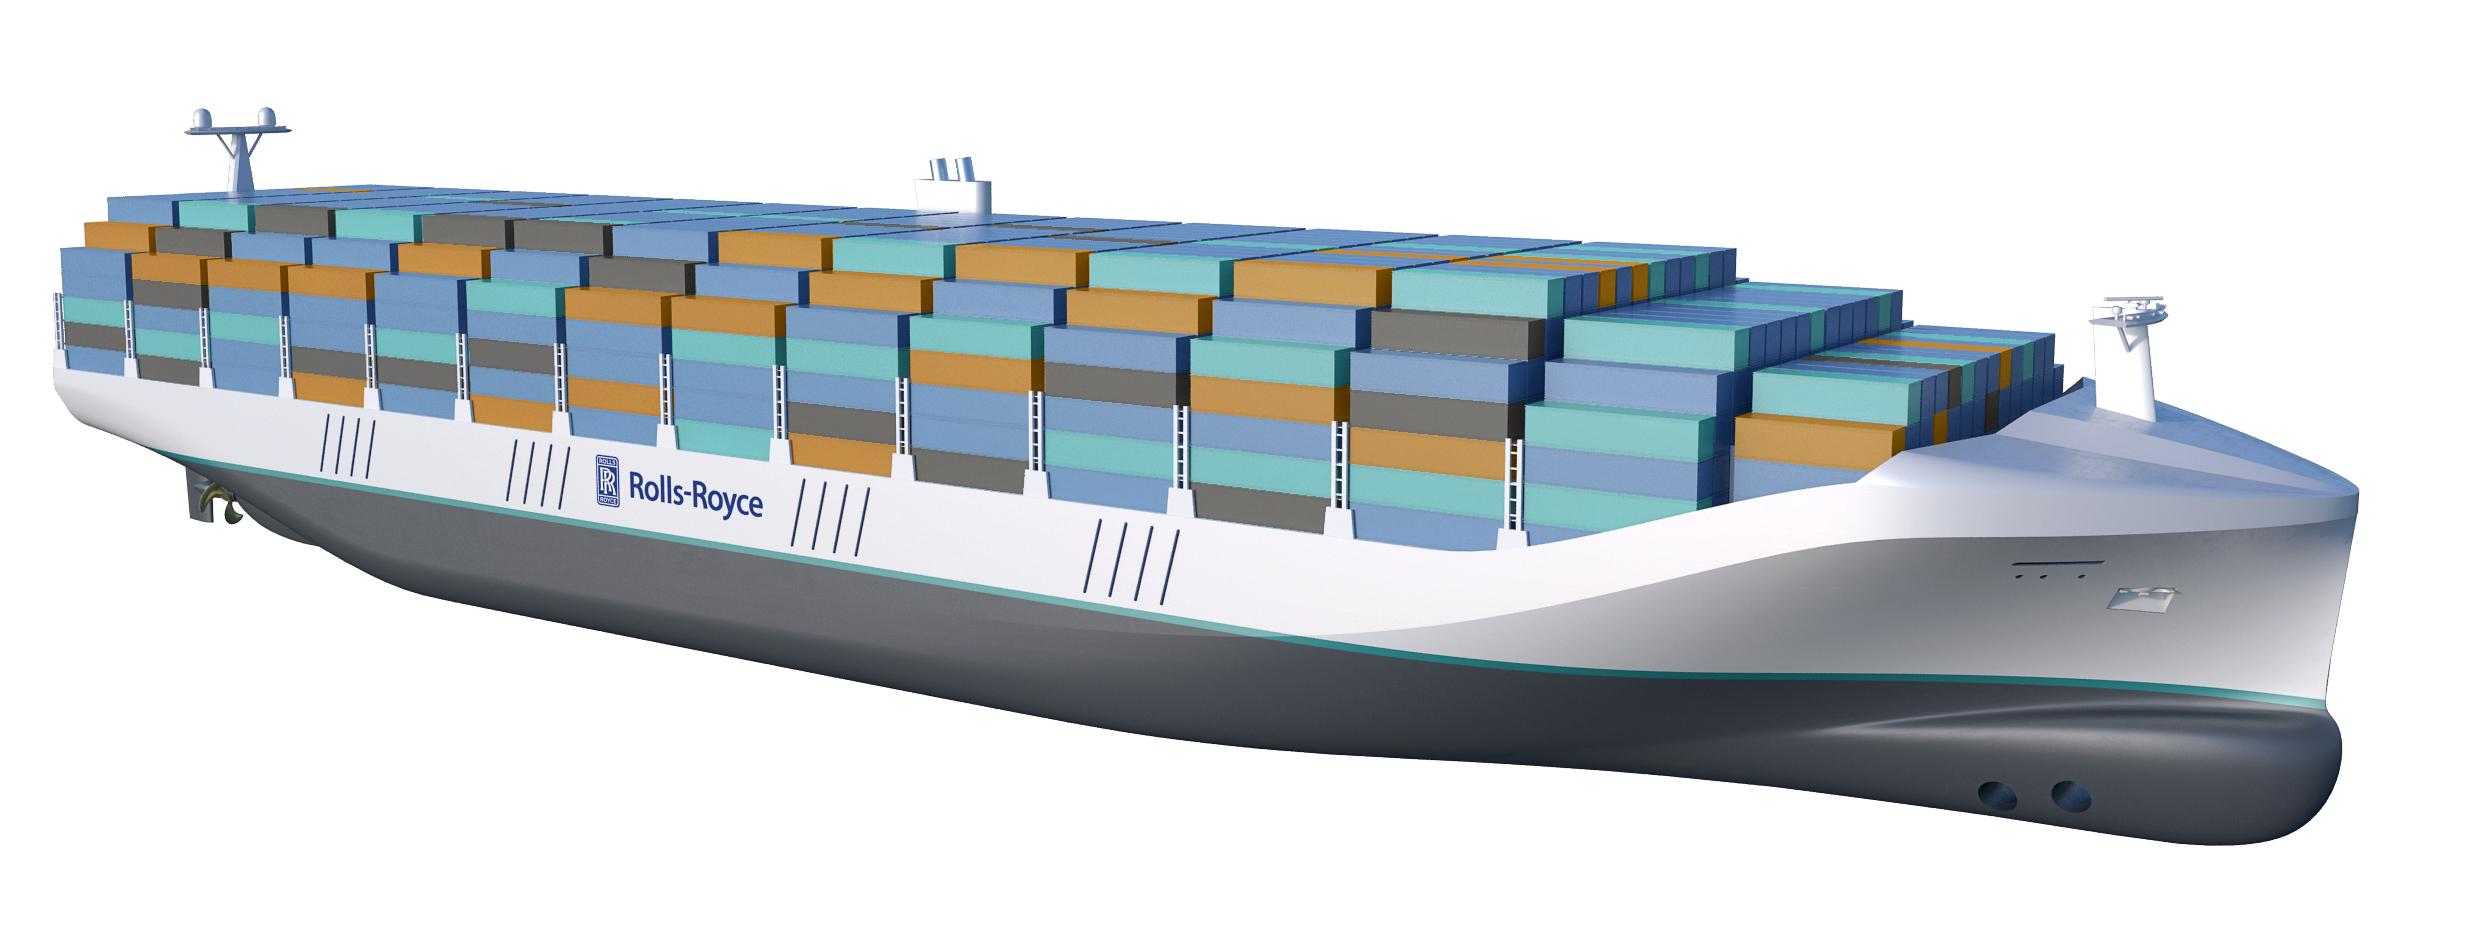 smart ship 4